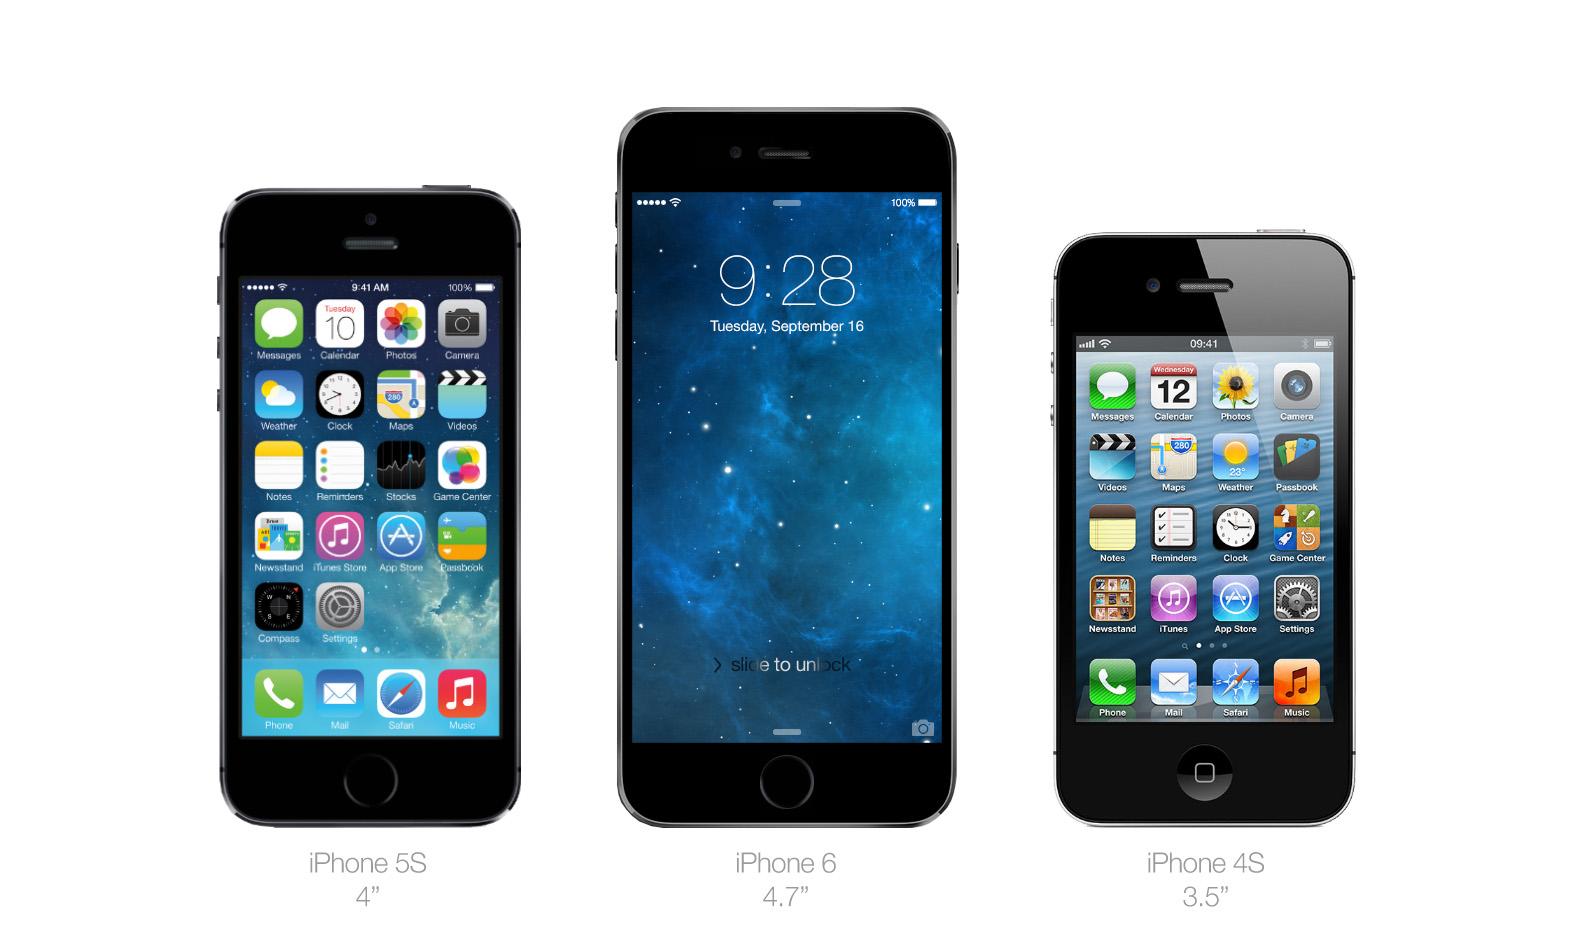 iPhone-6-vs-iPhone